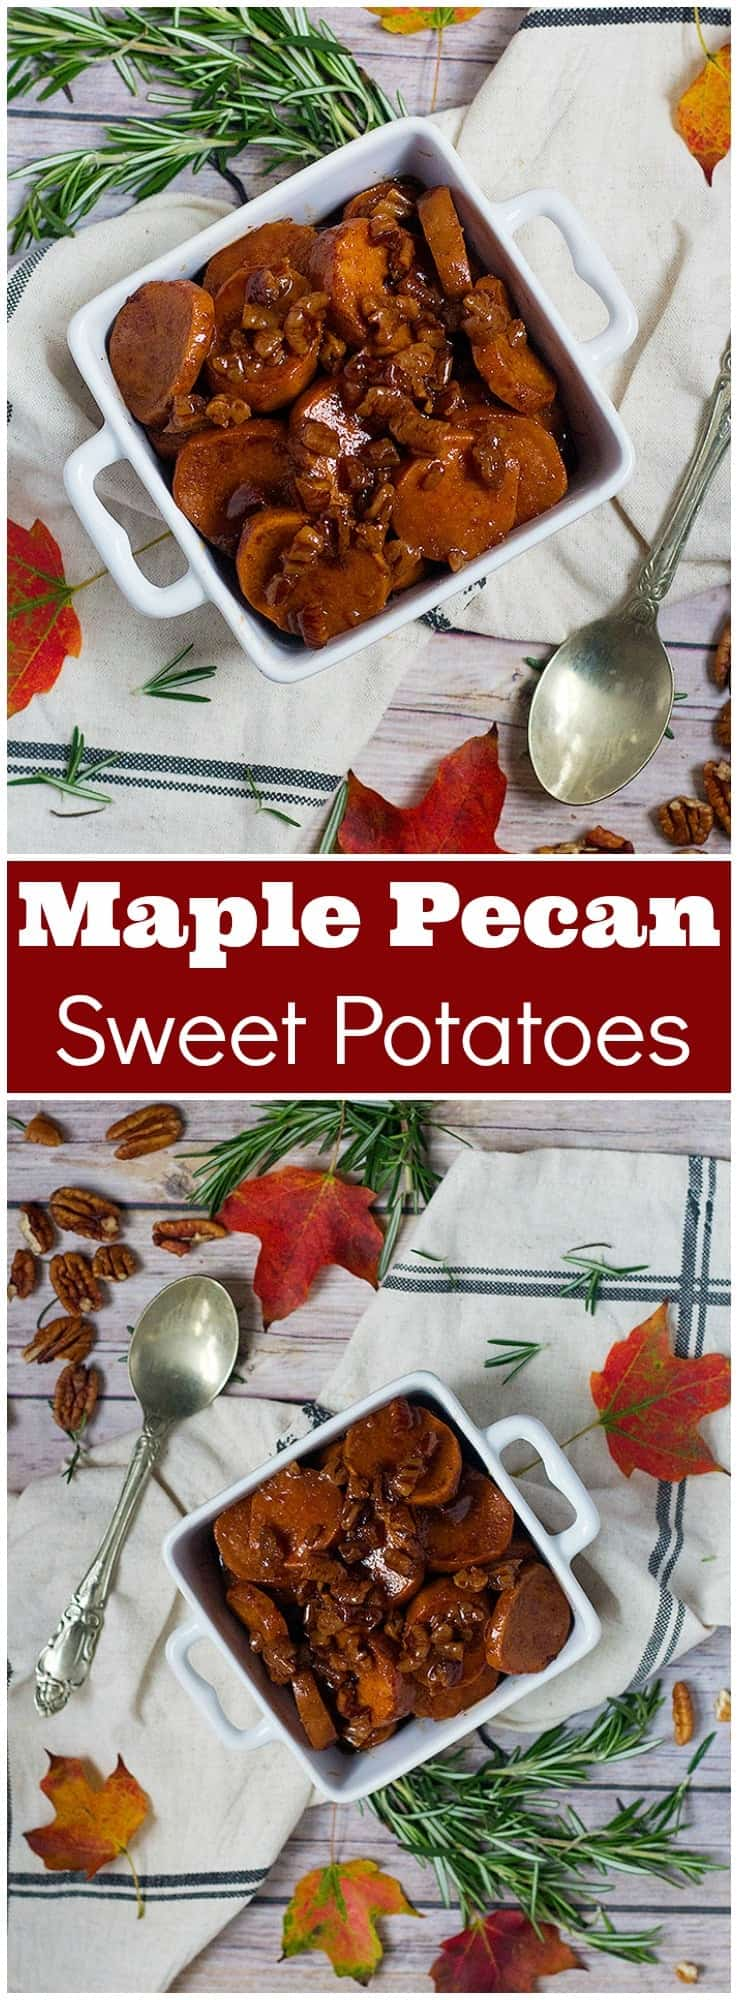 Maple Pecan Sweet Potatoes   maple pecan sweet potatoes mashed   maple pecan sweet potato Casserole   from unicornsinthekitchen.com